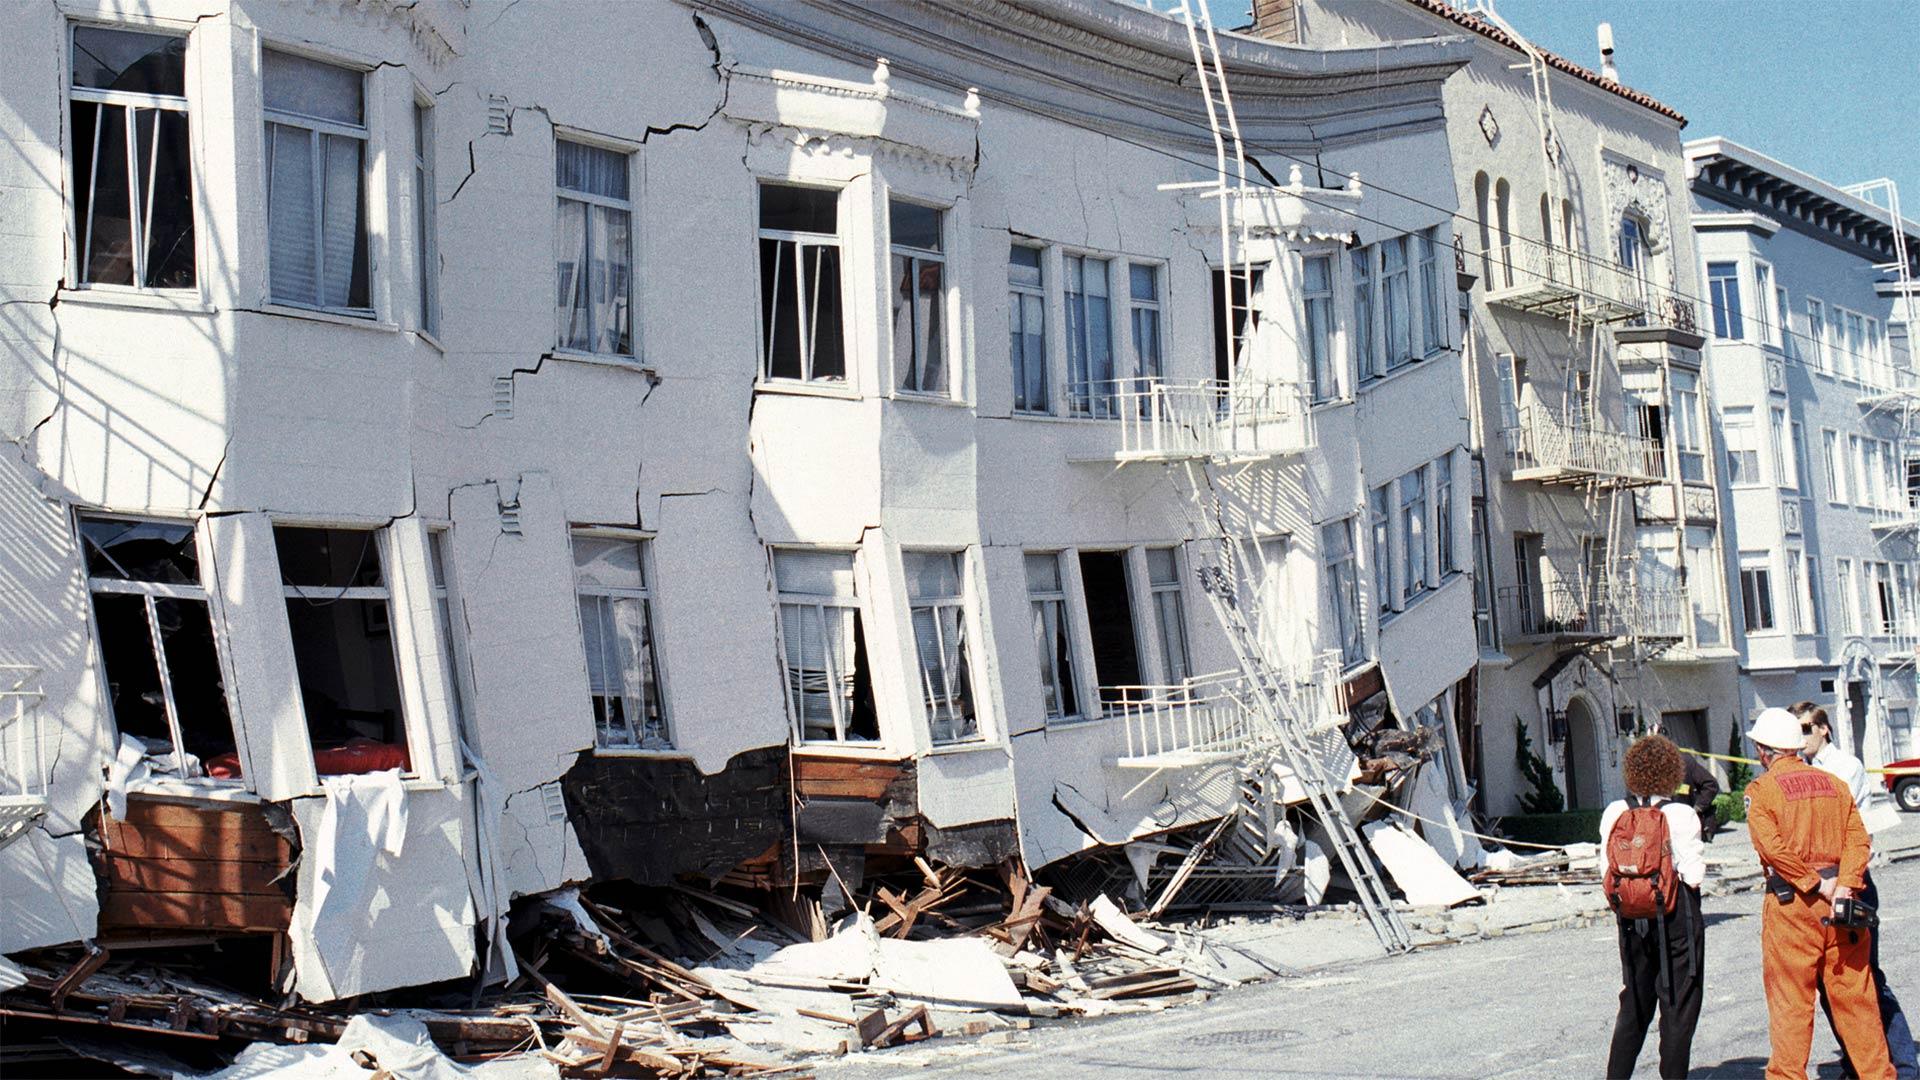 Loma Prieta 1989